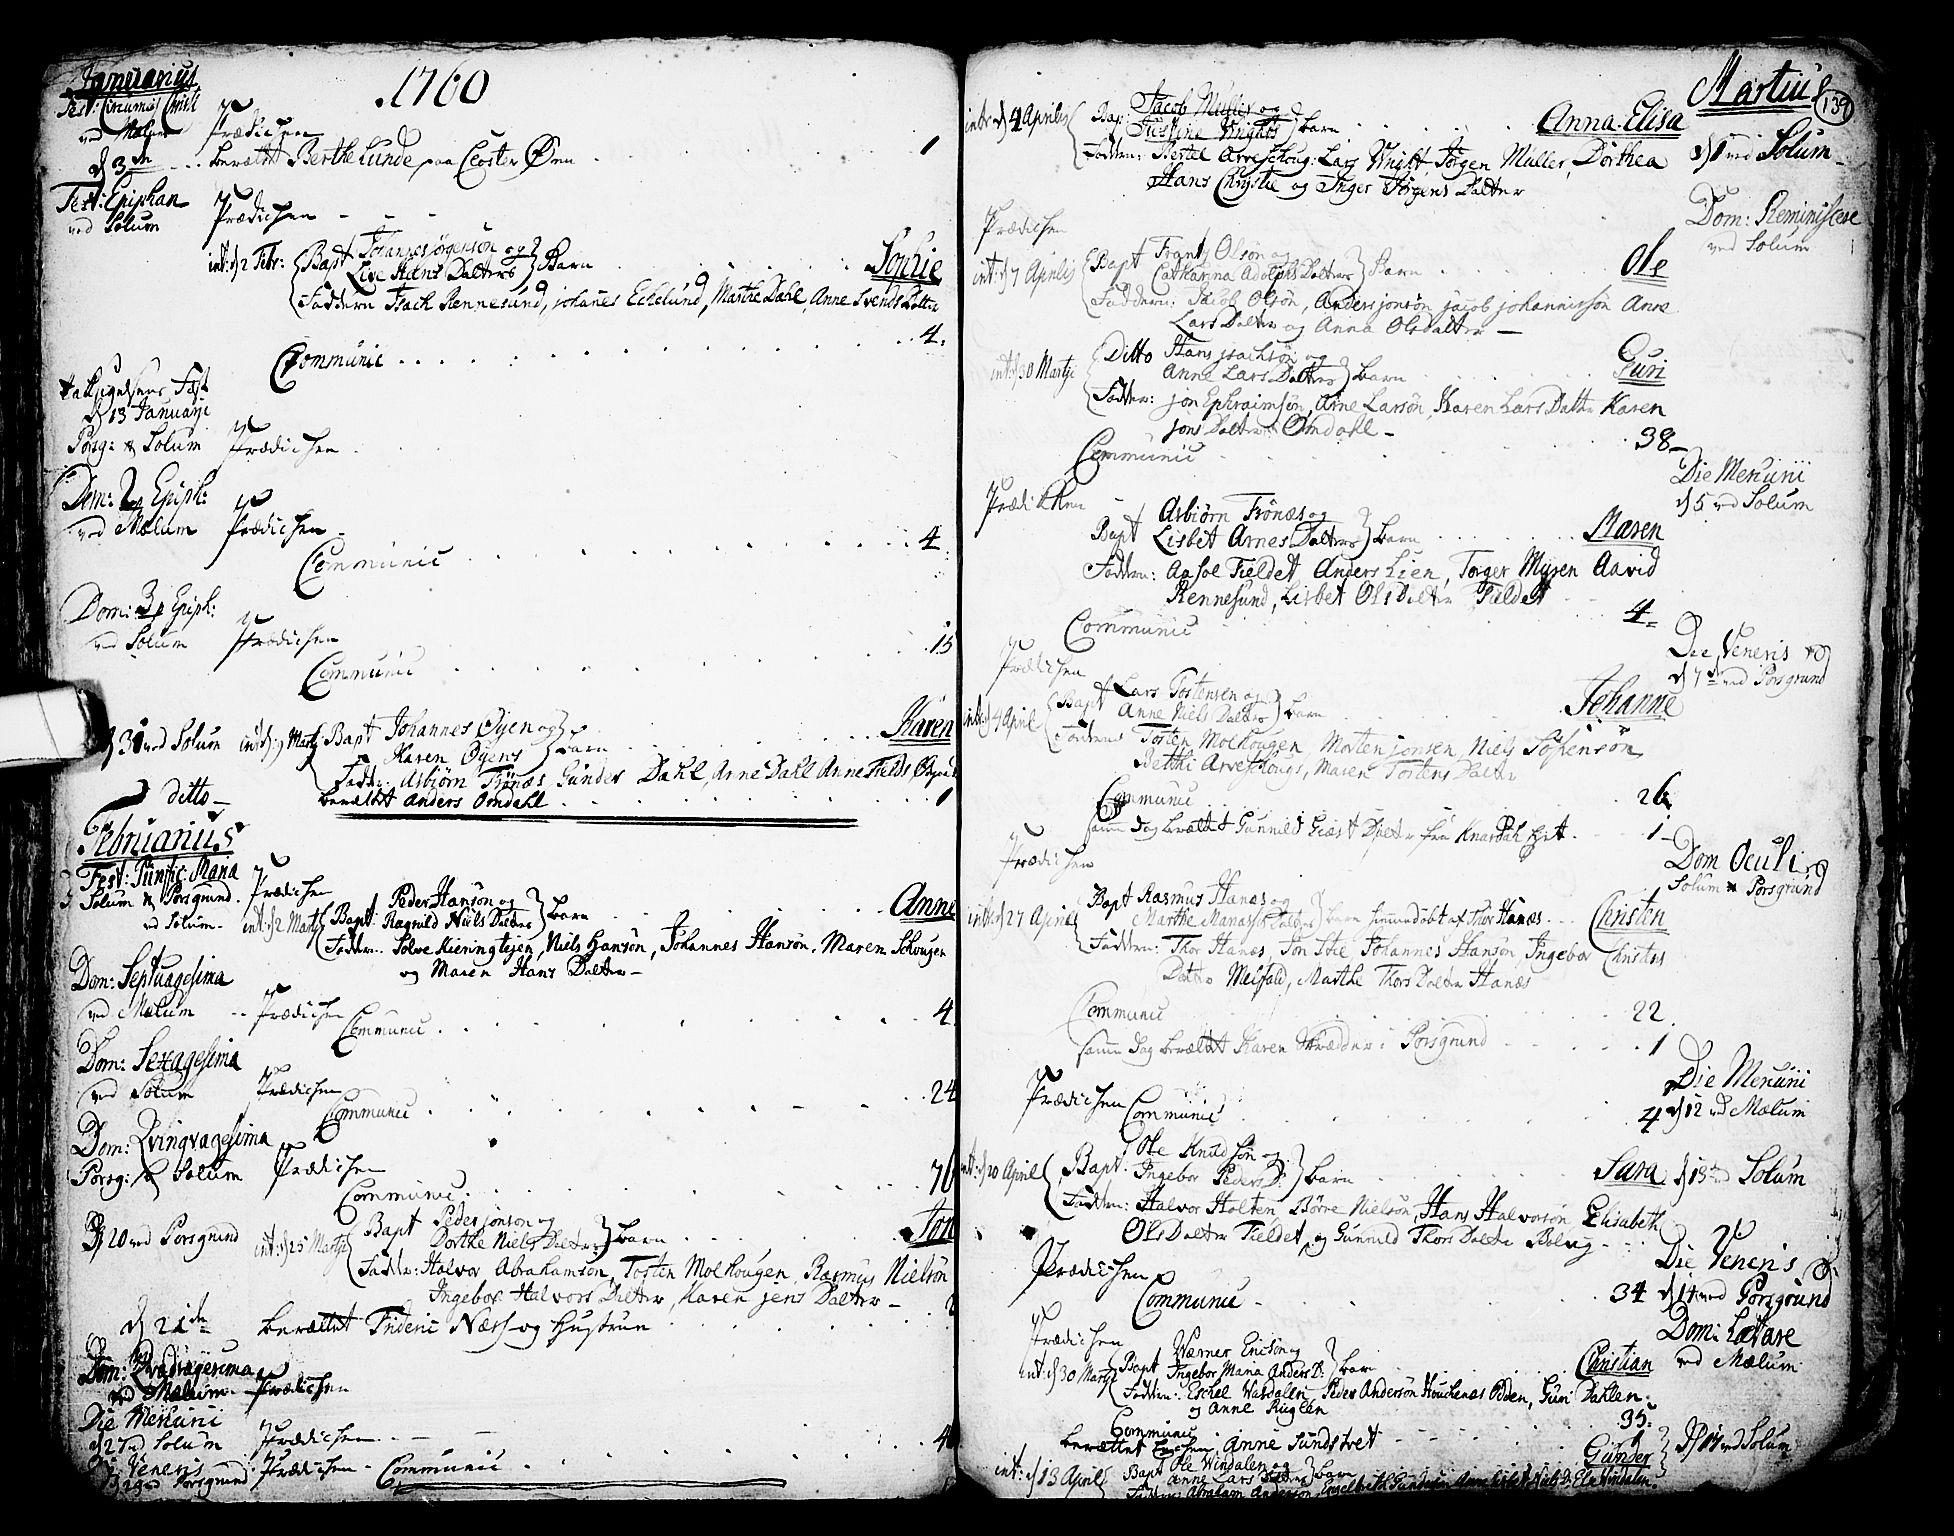 SAKO, Solum kirkebøker, F/Fa/L0002: Ministerialbok nr. I 2, 1713-1761, s. 139